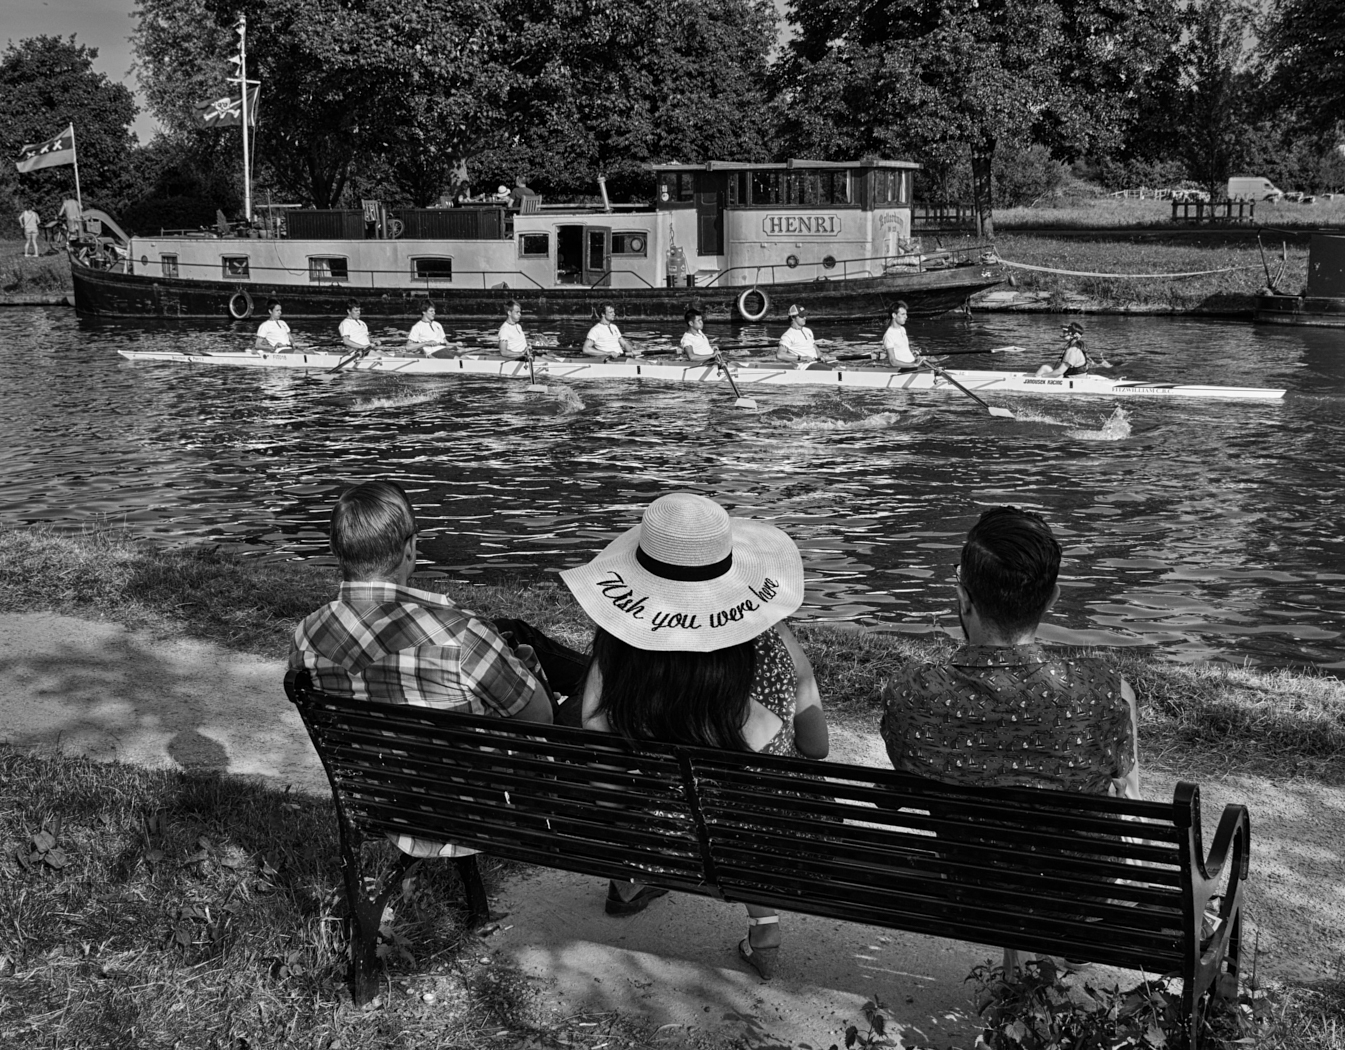 Watching the rowing1400x1050 sRGB.jpg